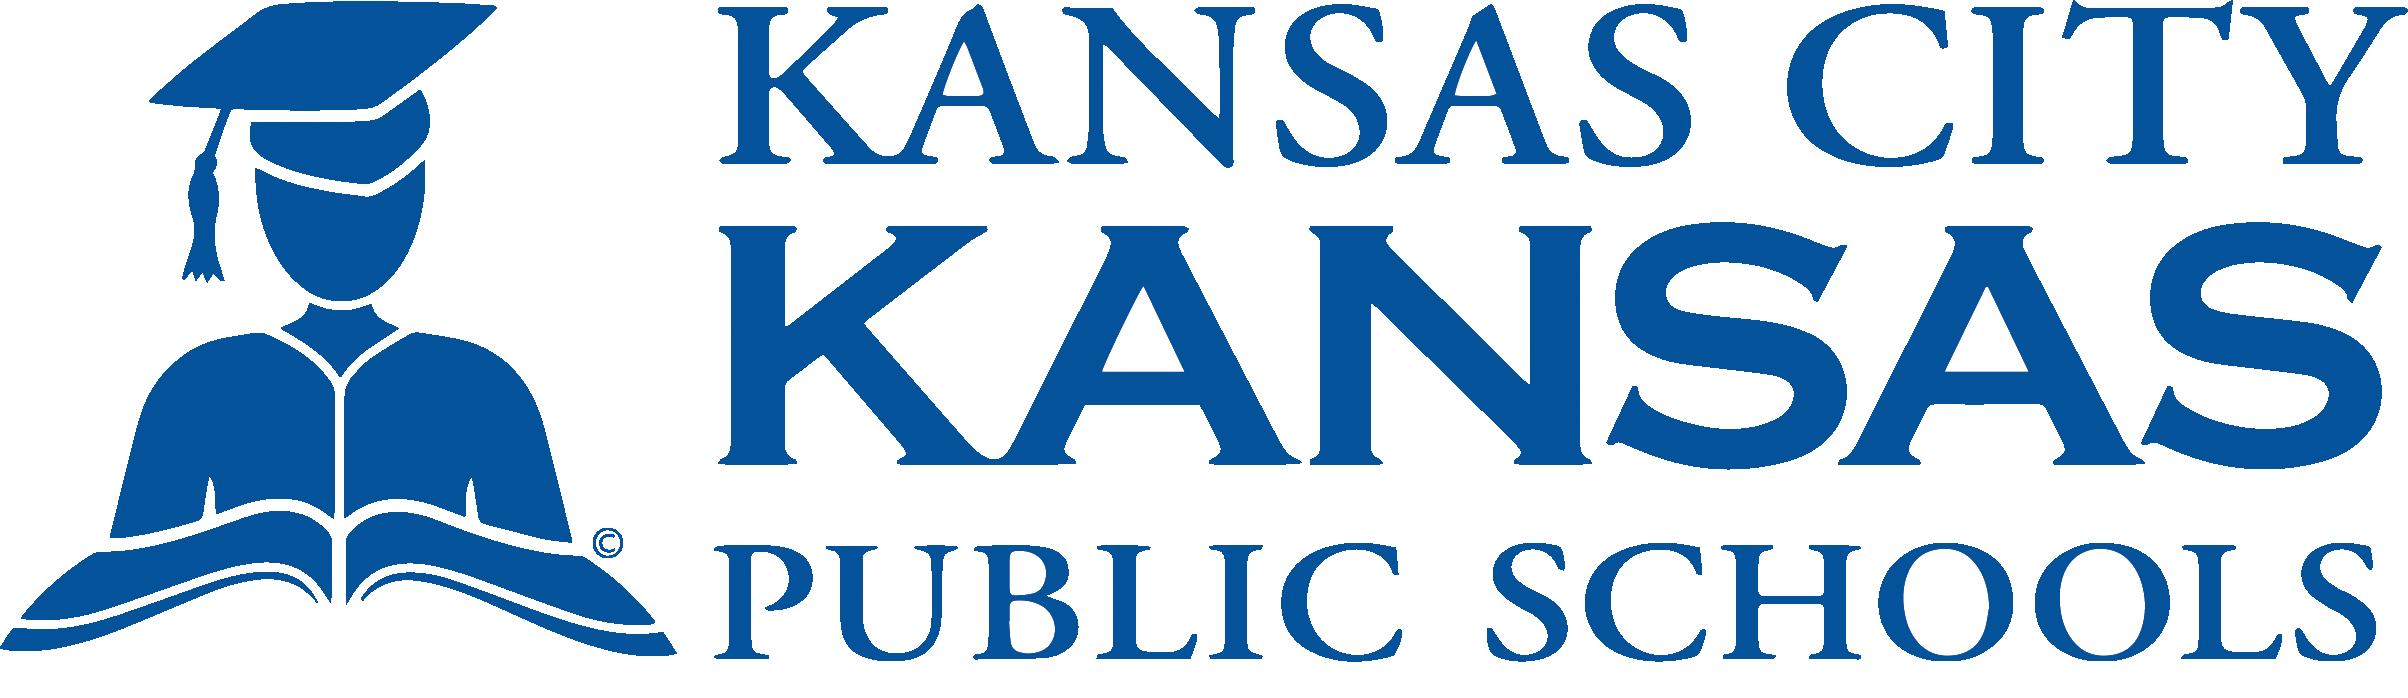 Kansas City, Kansas Public Schools